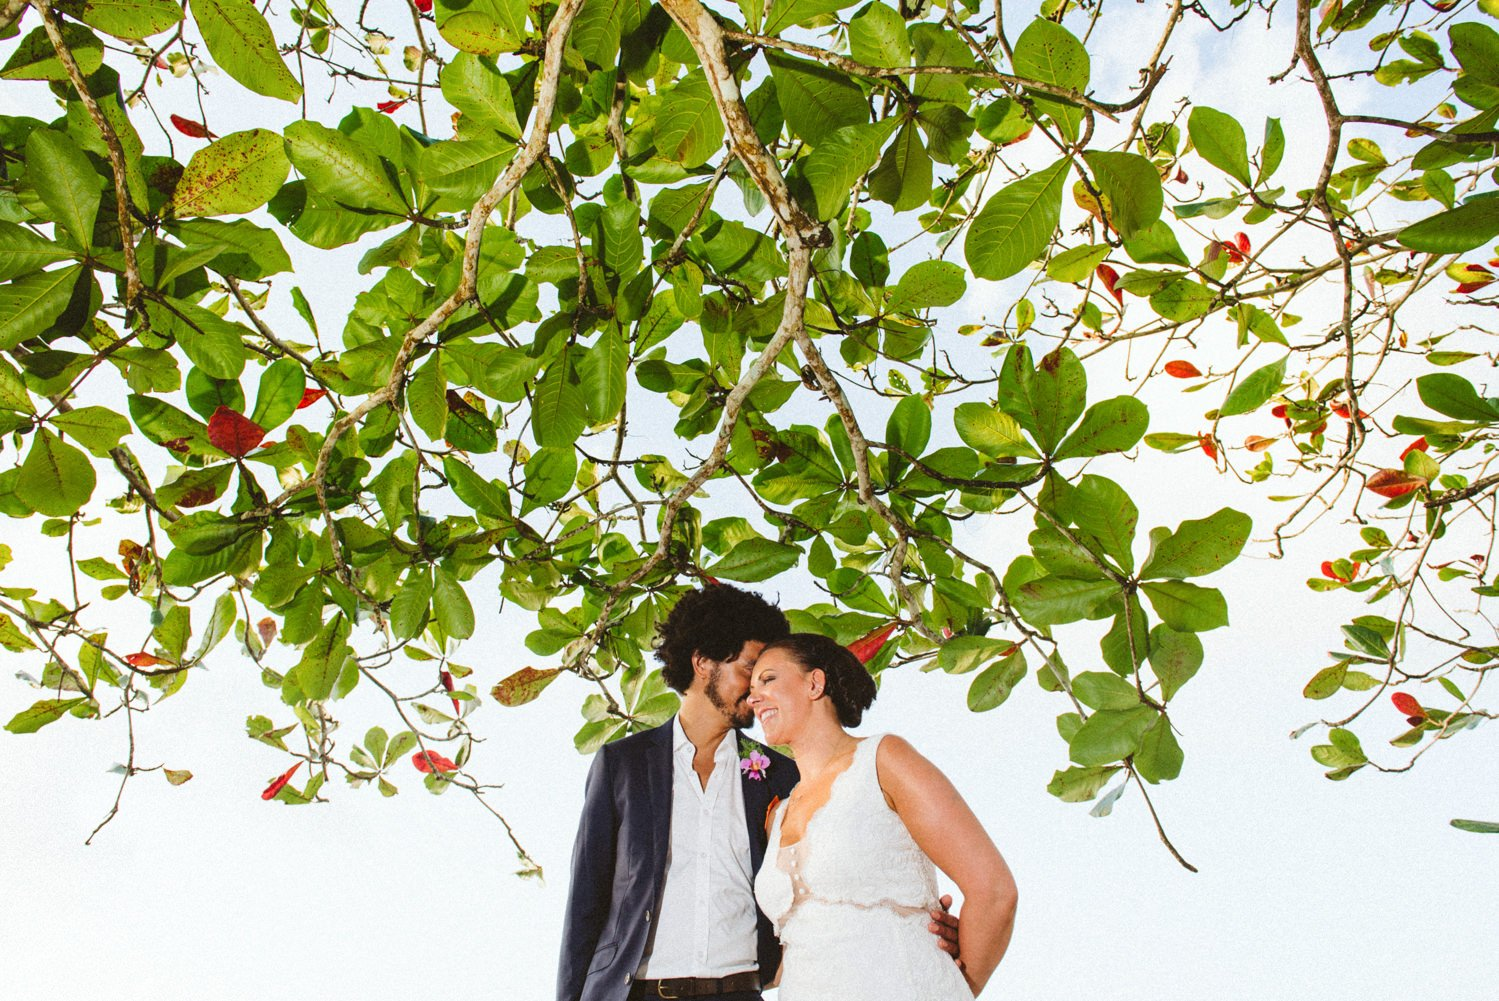 Tobago wedding portrait Babb photo